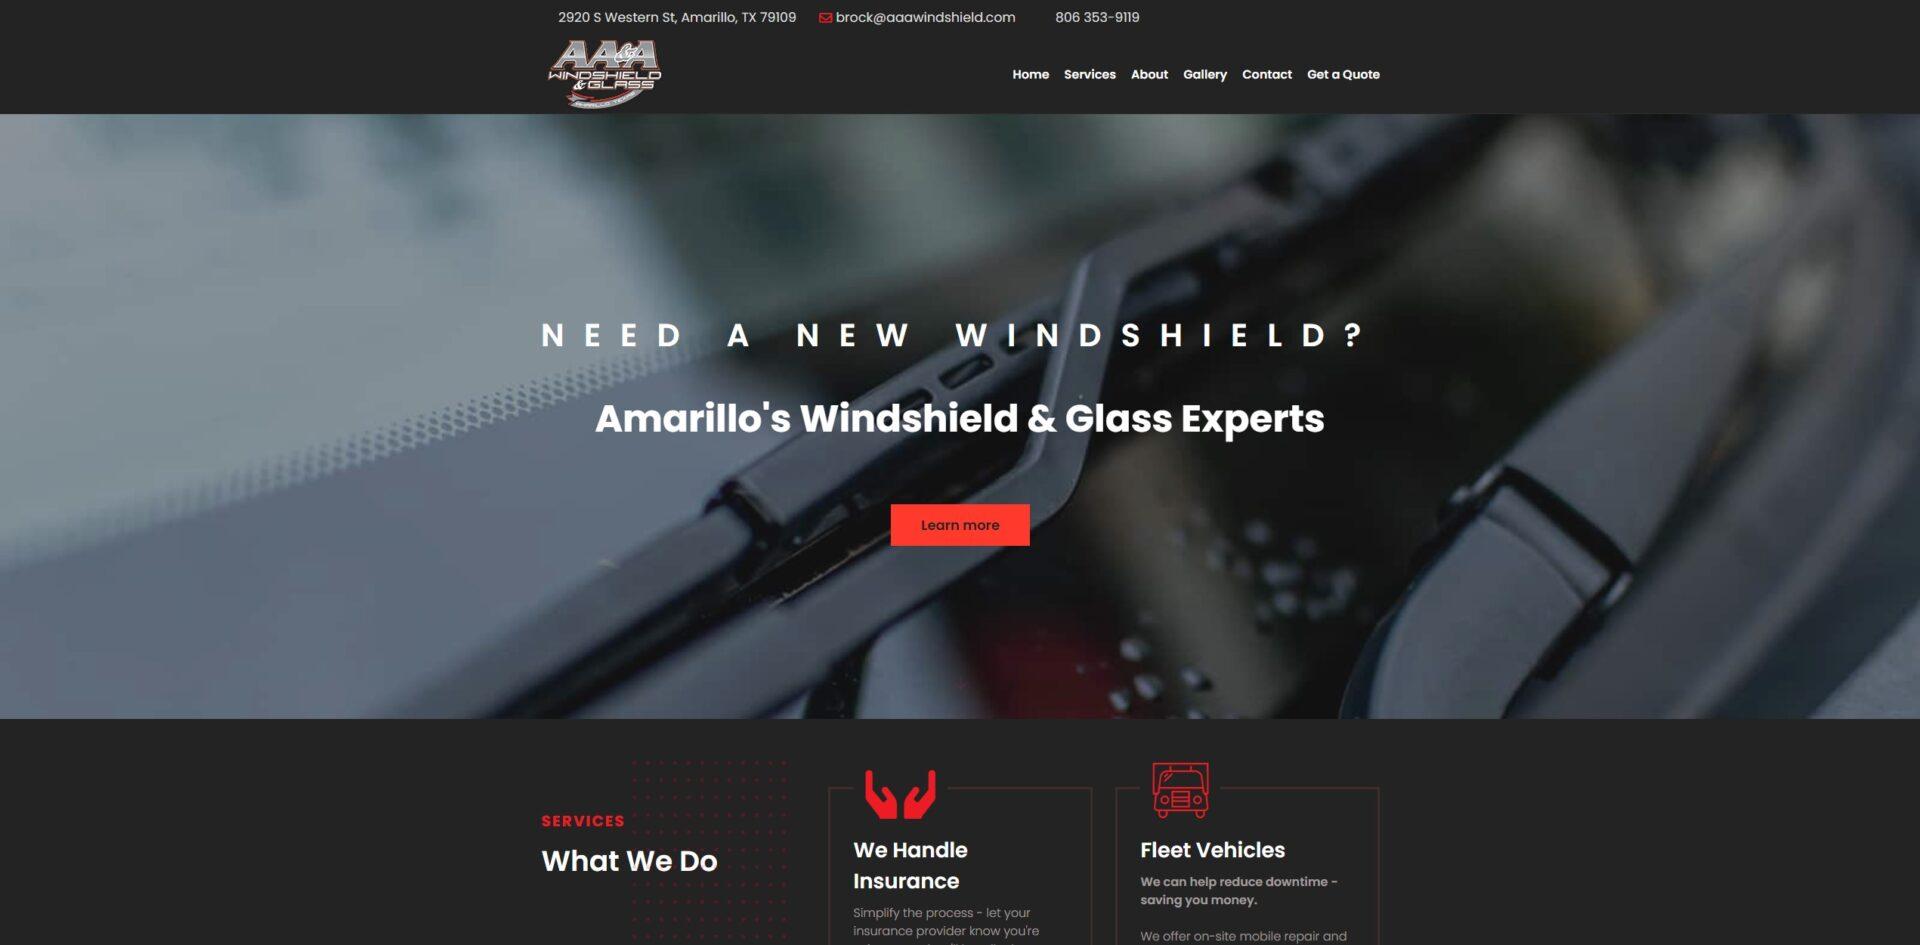 aaa-windshield-amarillo-texas-website